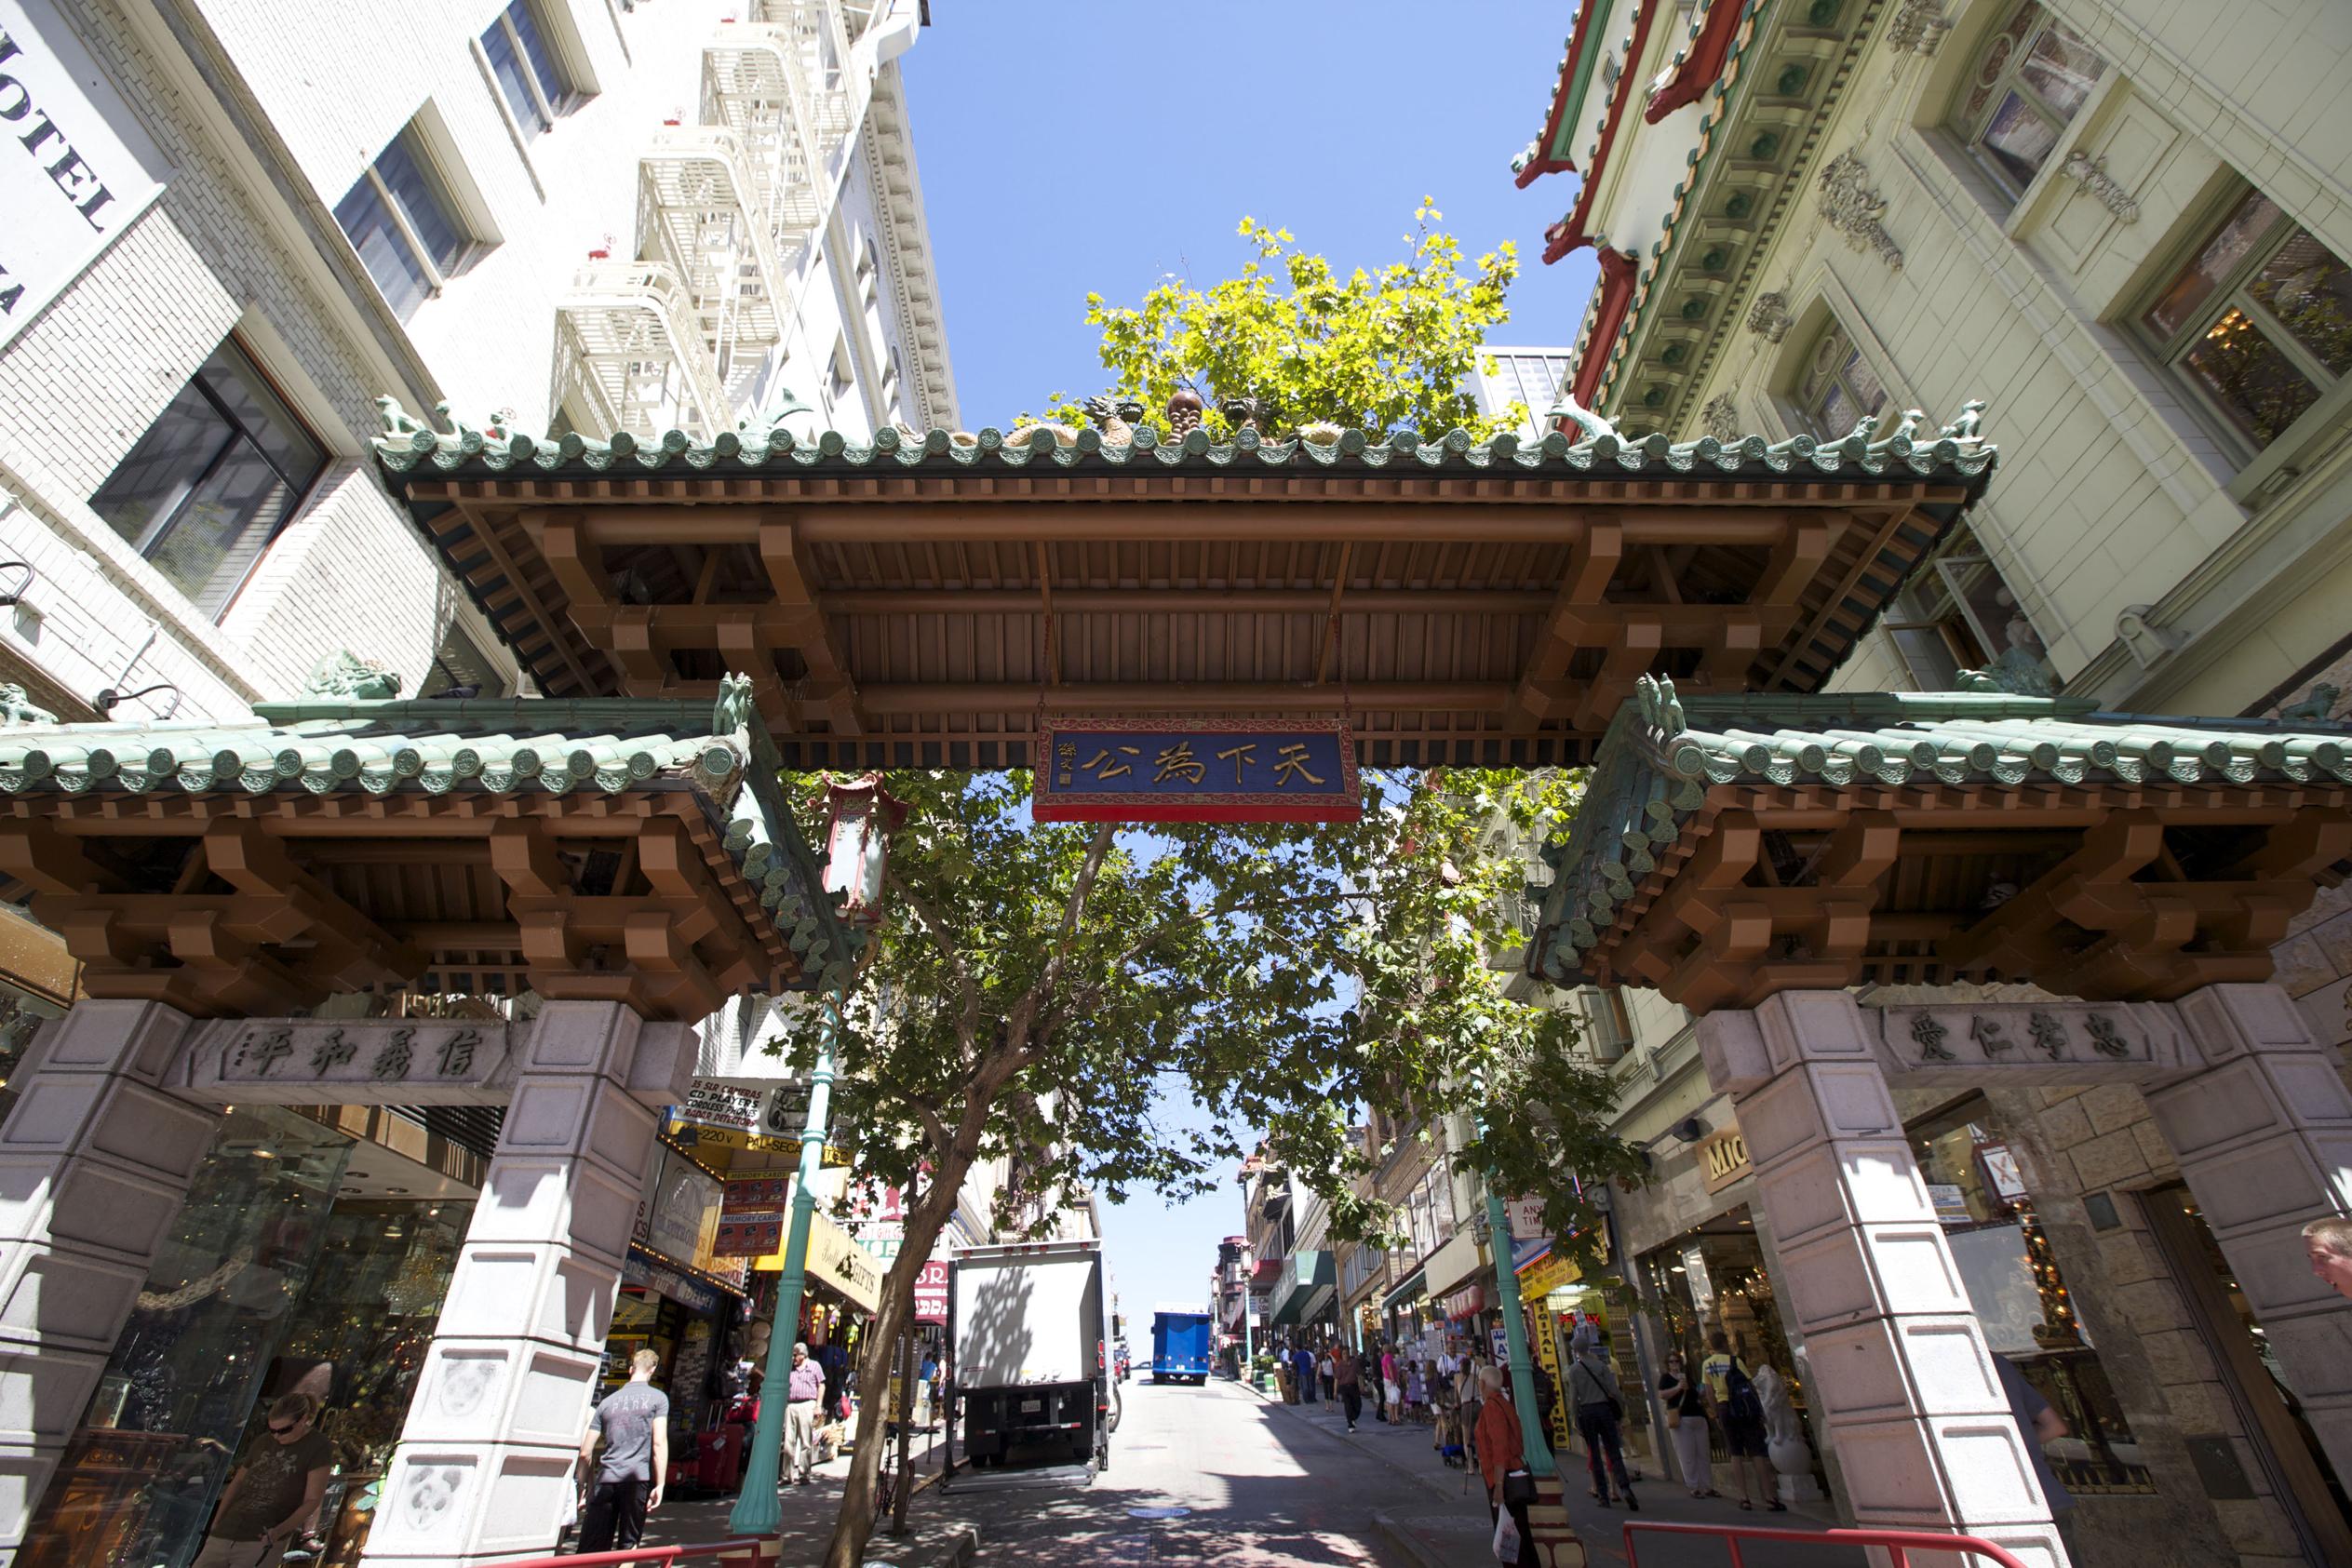 Credit: San Francisco Travel Association/Scott Chernis